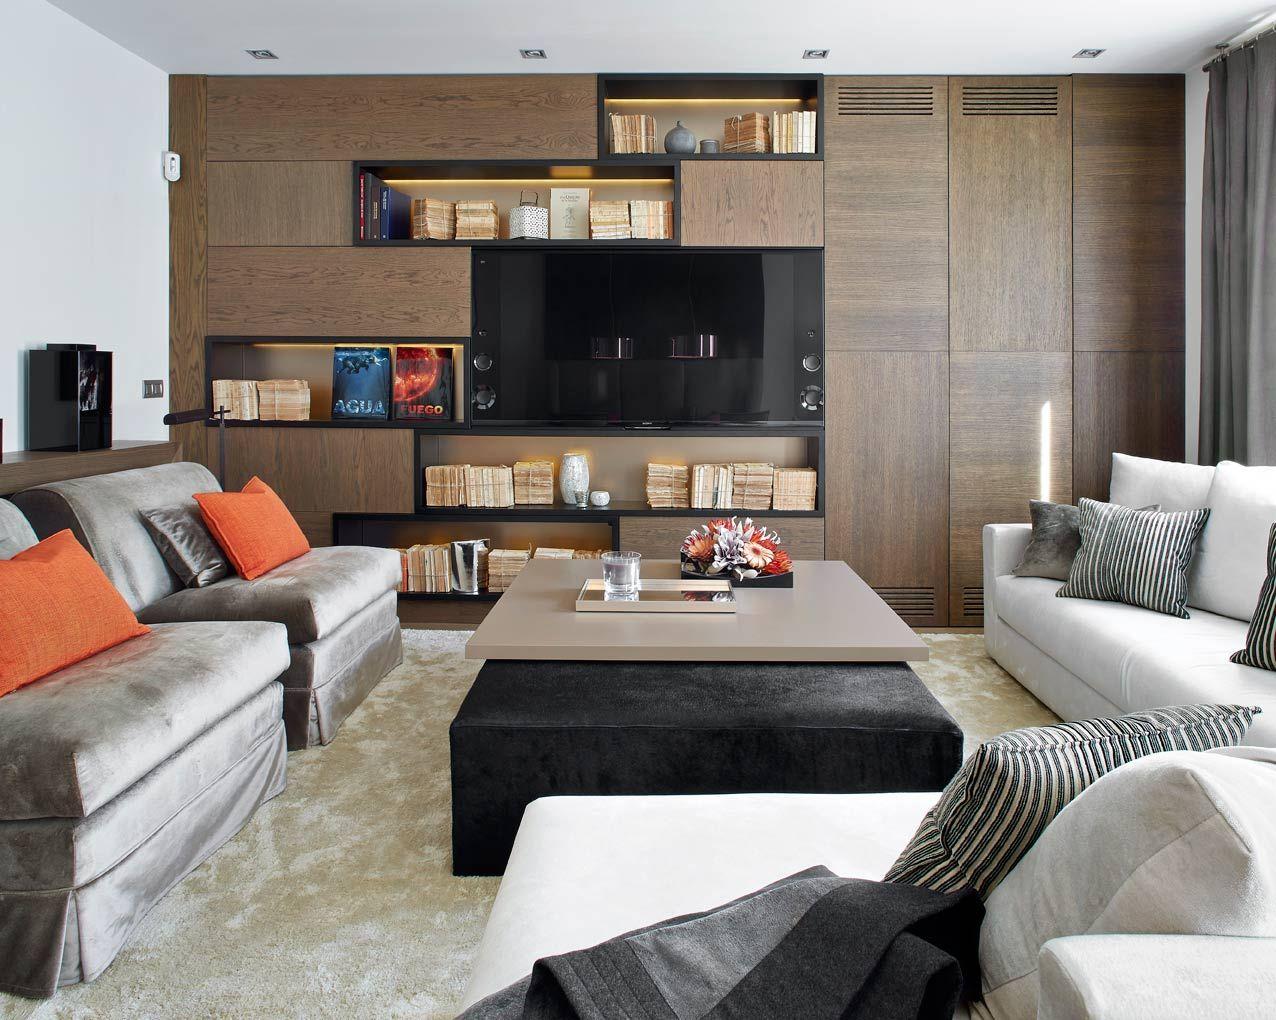 molins interiors saln principal biblioteca libreria de madera sofs mesa